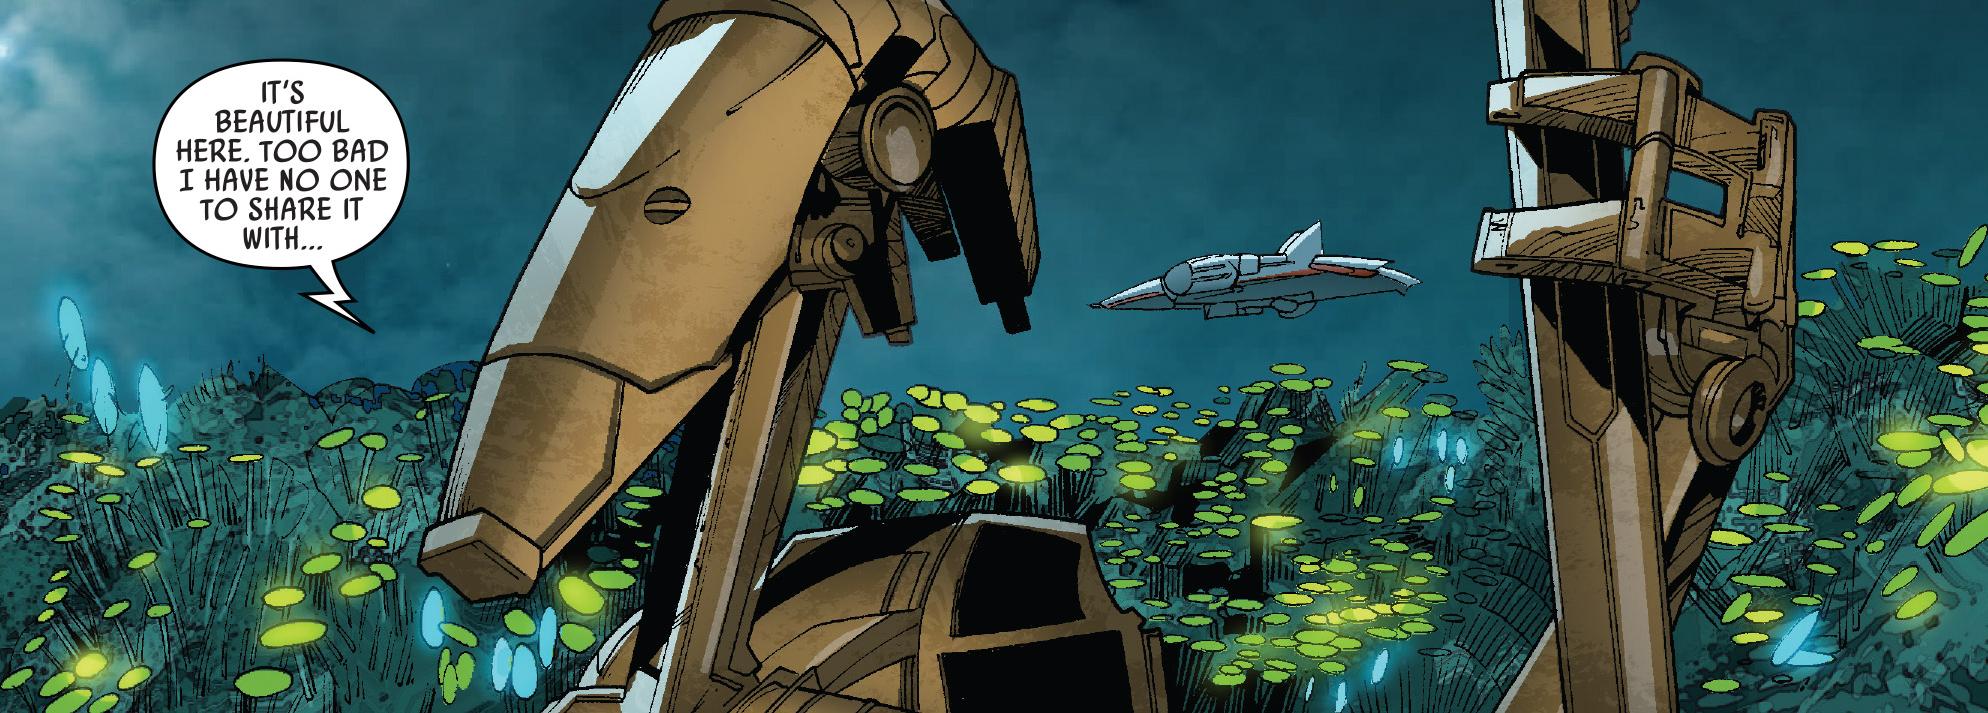 Unidentified B1 battle droid (Hissrich)